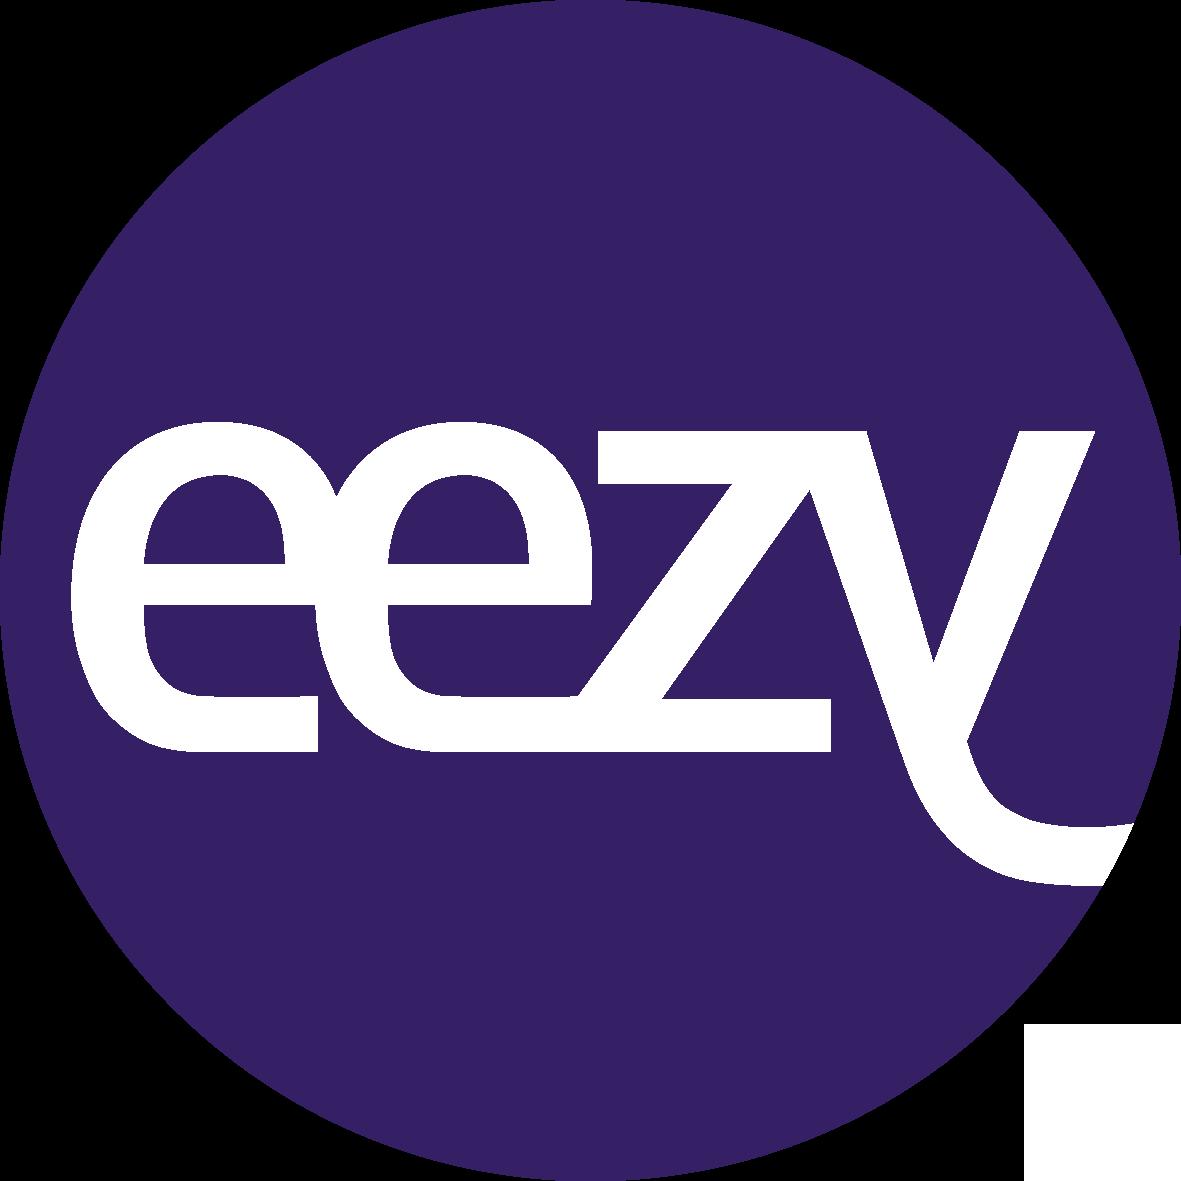 logo: Eezy Oyj